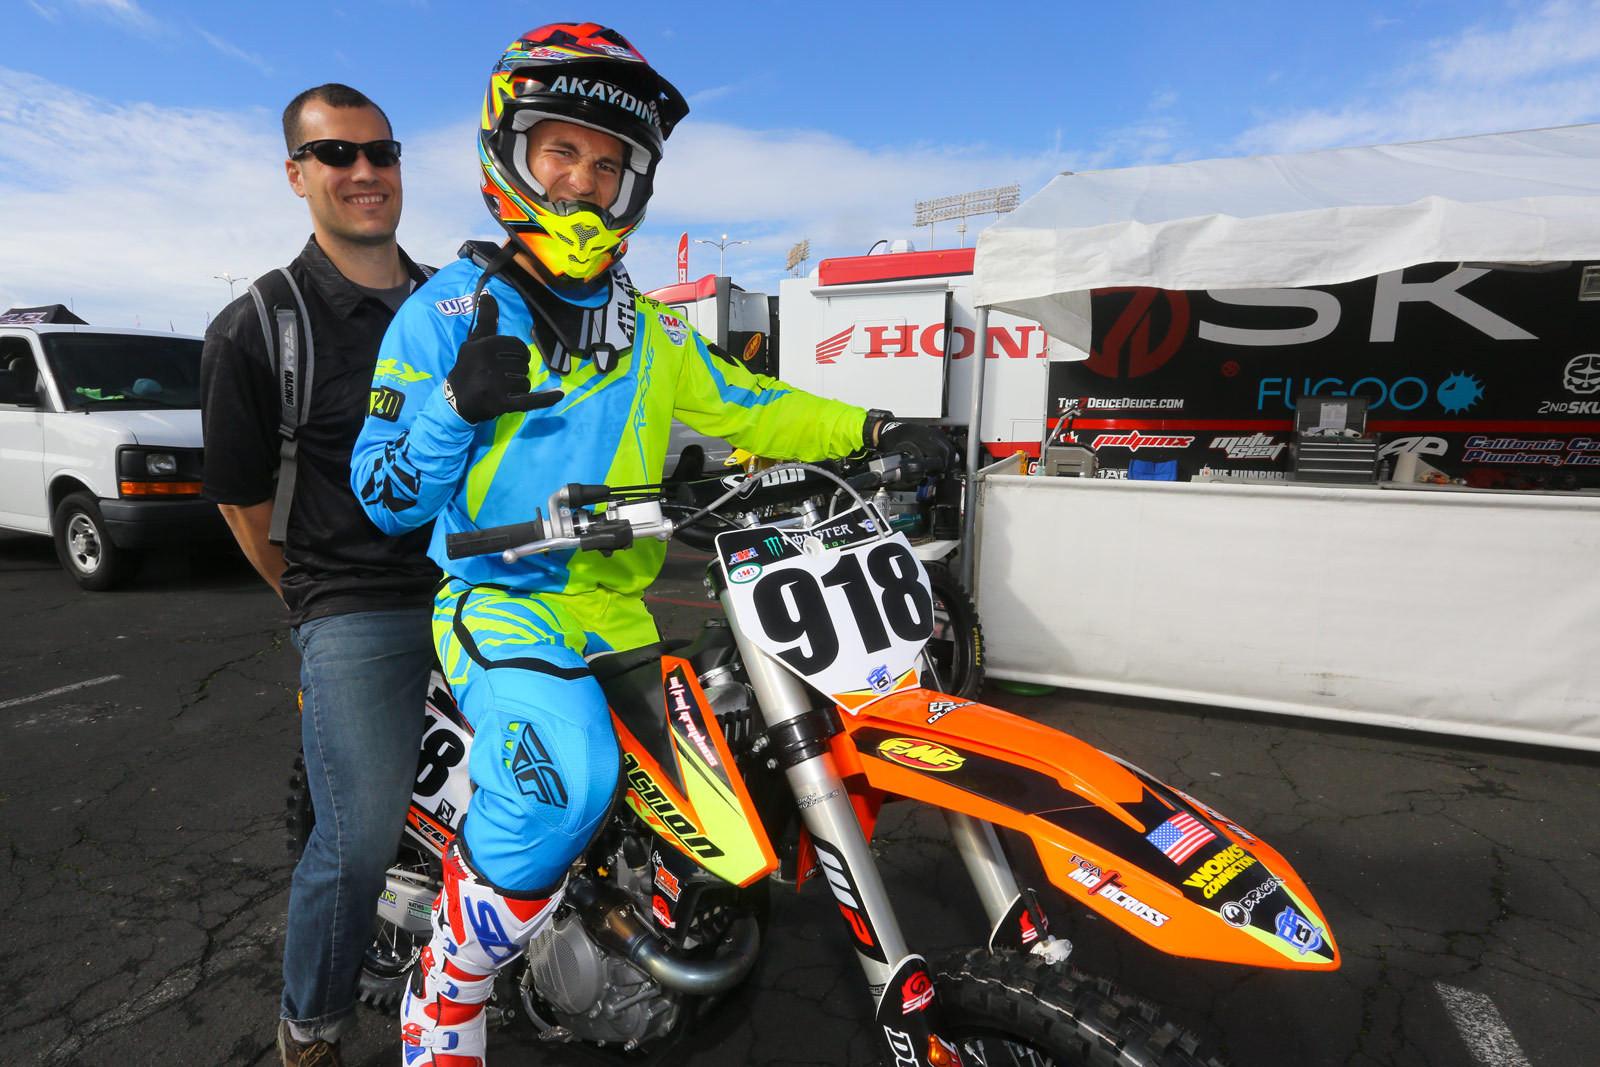 Michael Akaydin - Vital MX Pit Bits: Oakland - Motocross Pictures - Vital MX